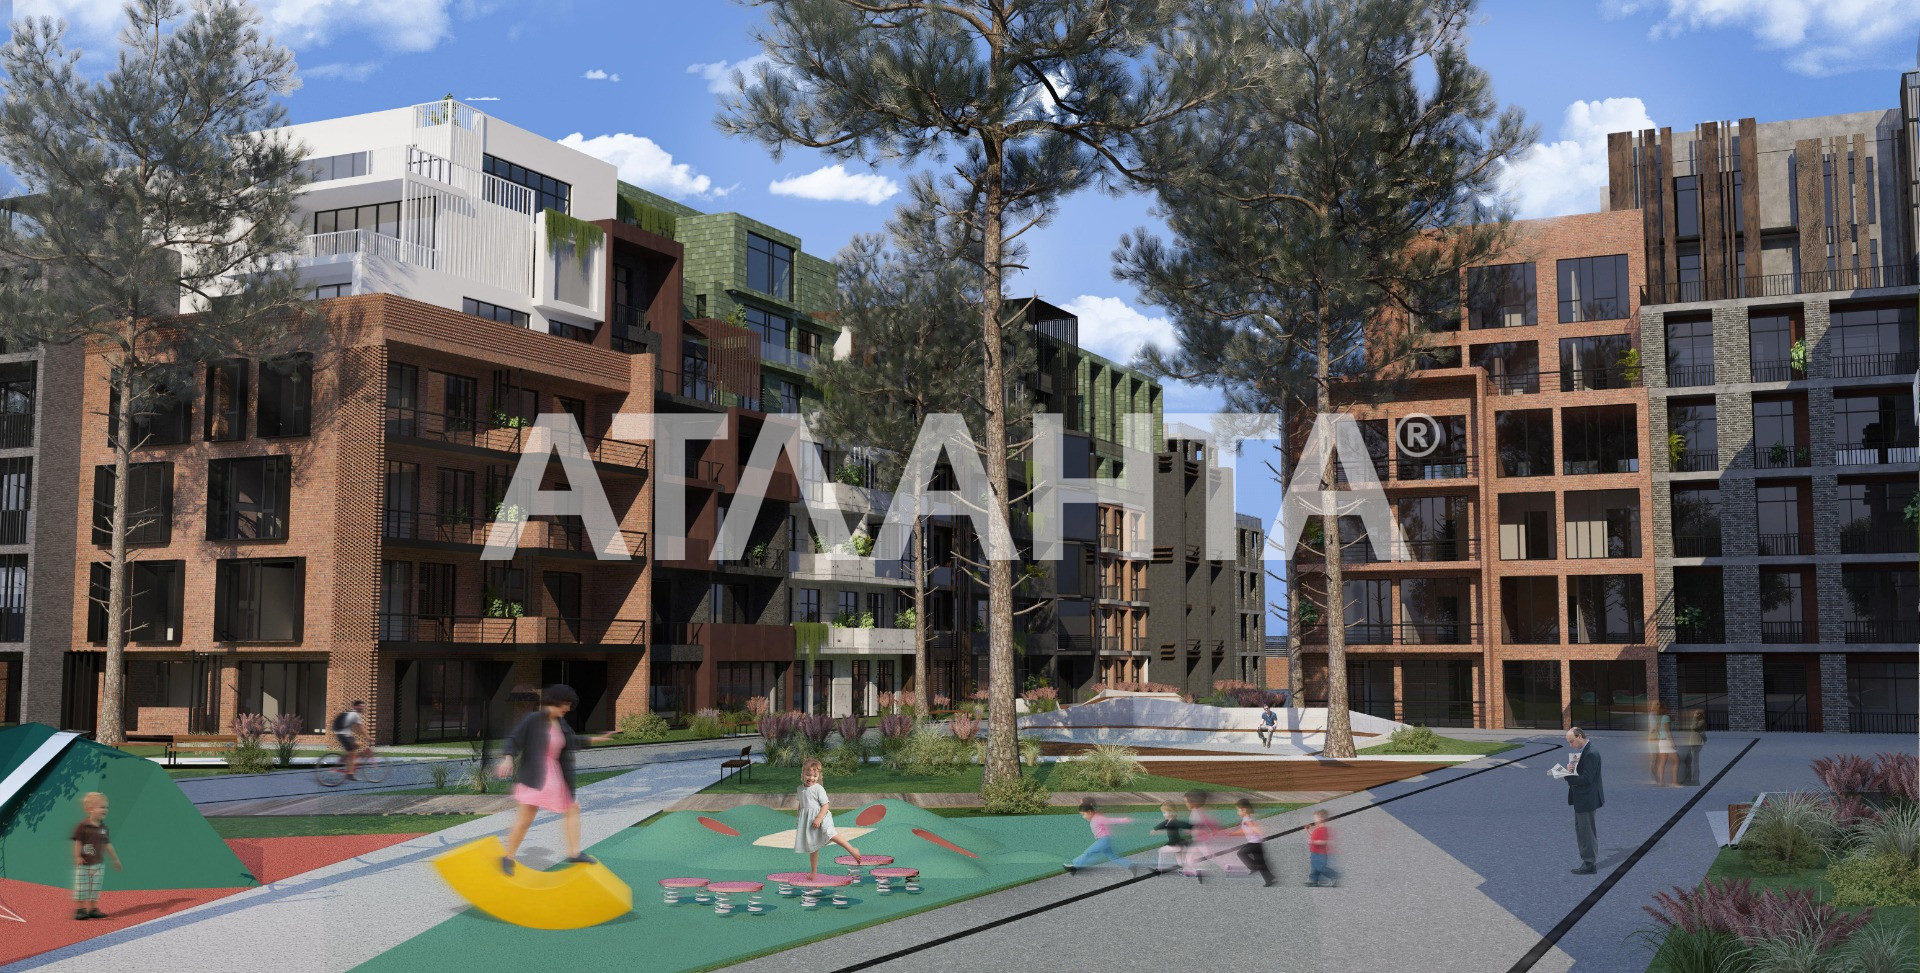 Продается 1-комнатная Квартира на ул. Донского Дмитрия — 74 520 у.е. (фото №2)